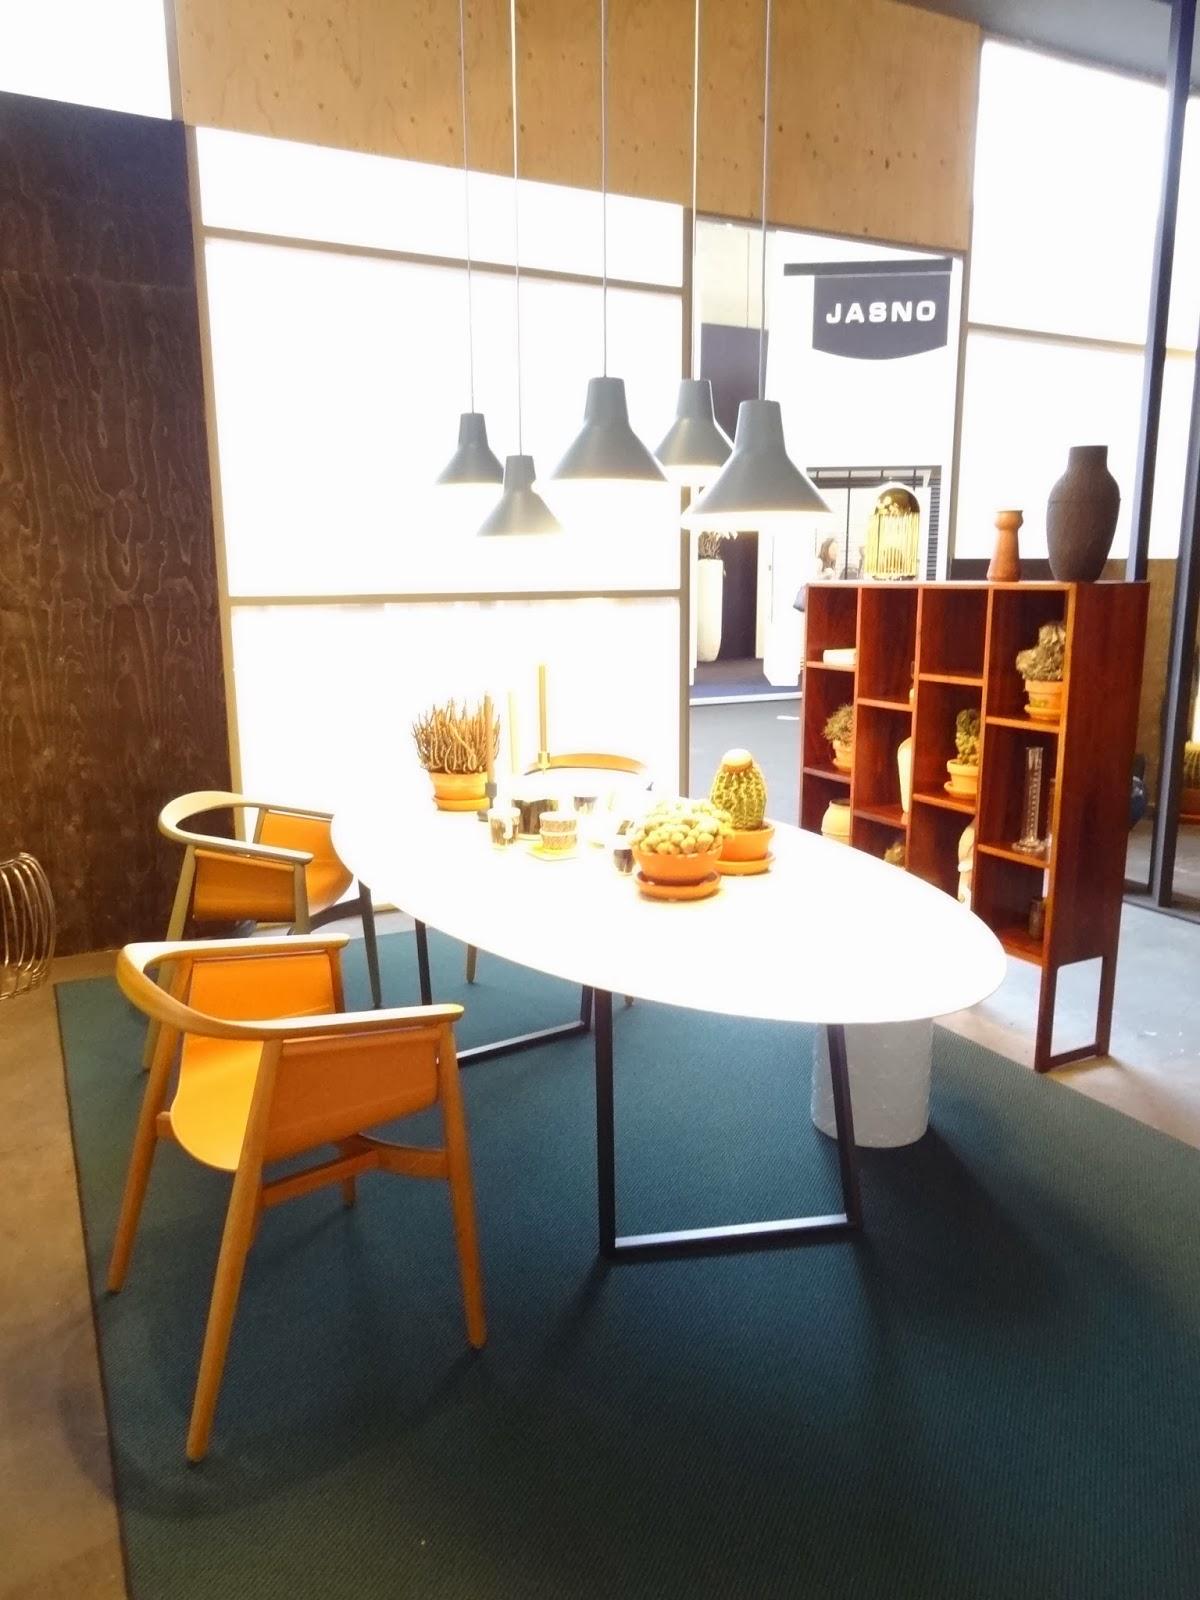 Nordic blends woonbeurs de huizen for Eigen huis interieur abonnement